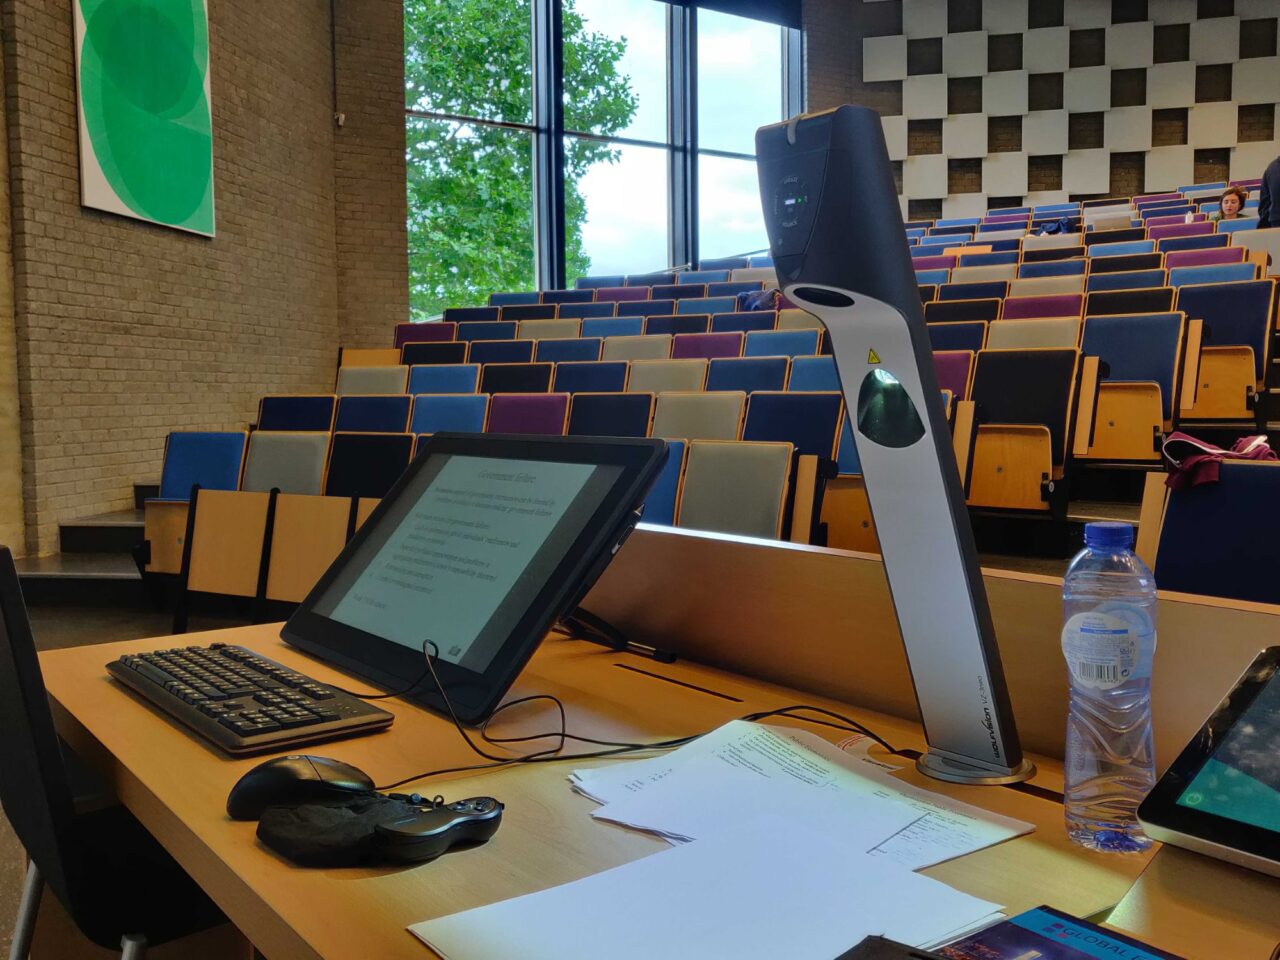 hybride college onderwijszaal laptop camera foto Wouter Sterernburg (4) (EM)